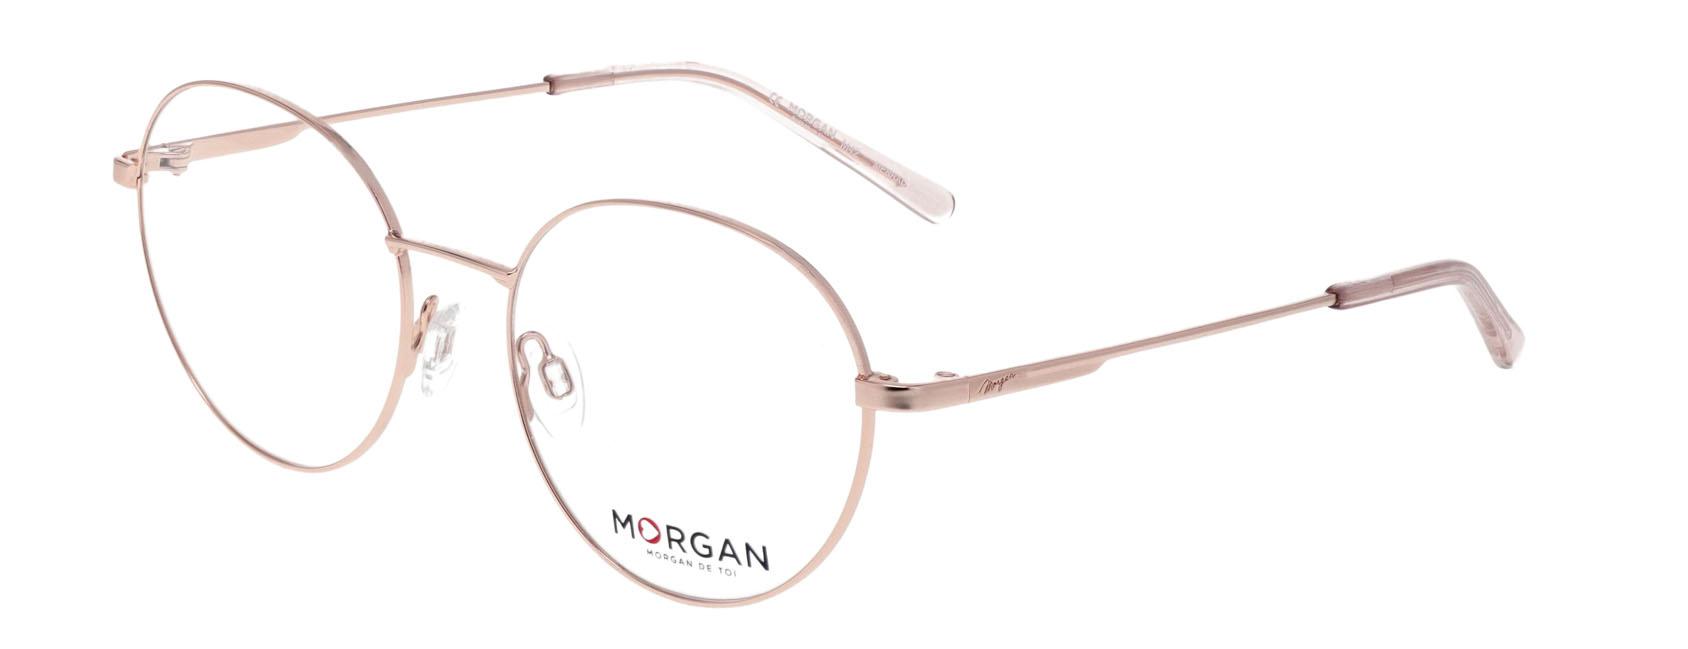 Morgan 203211 7100